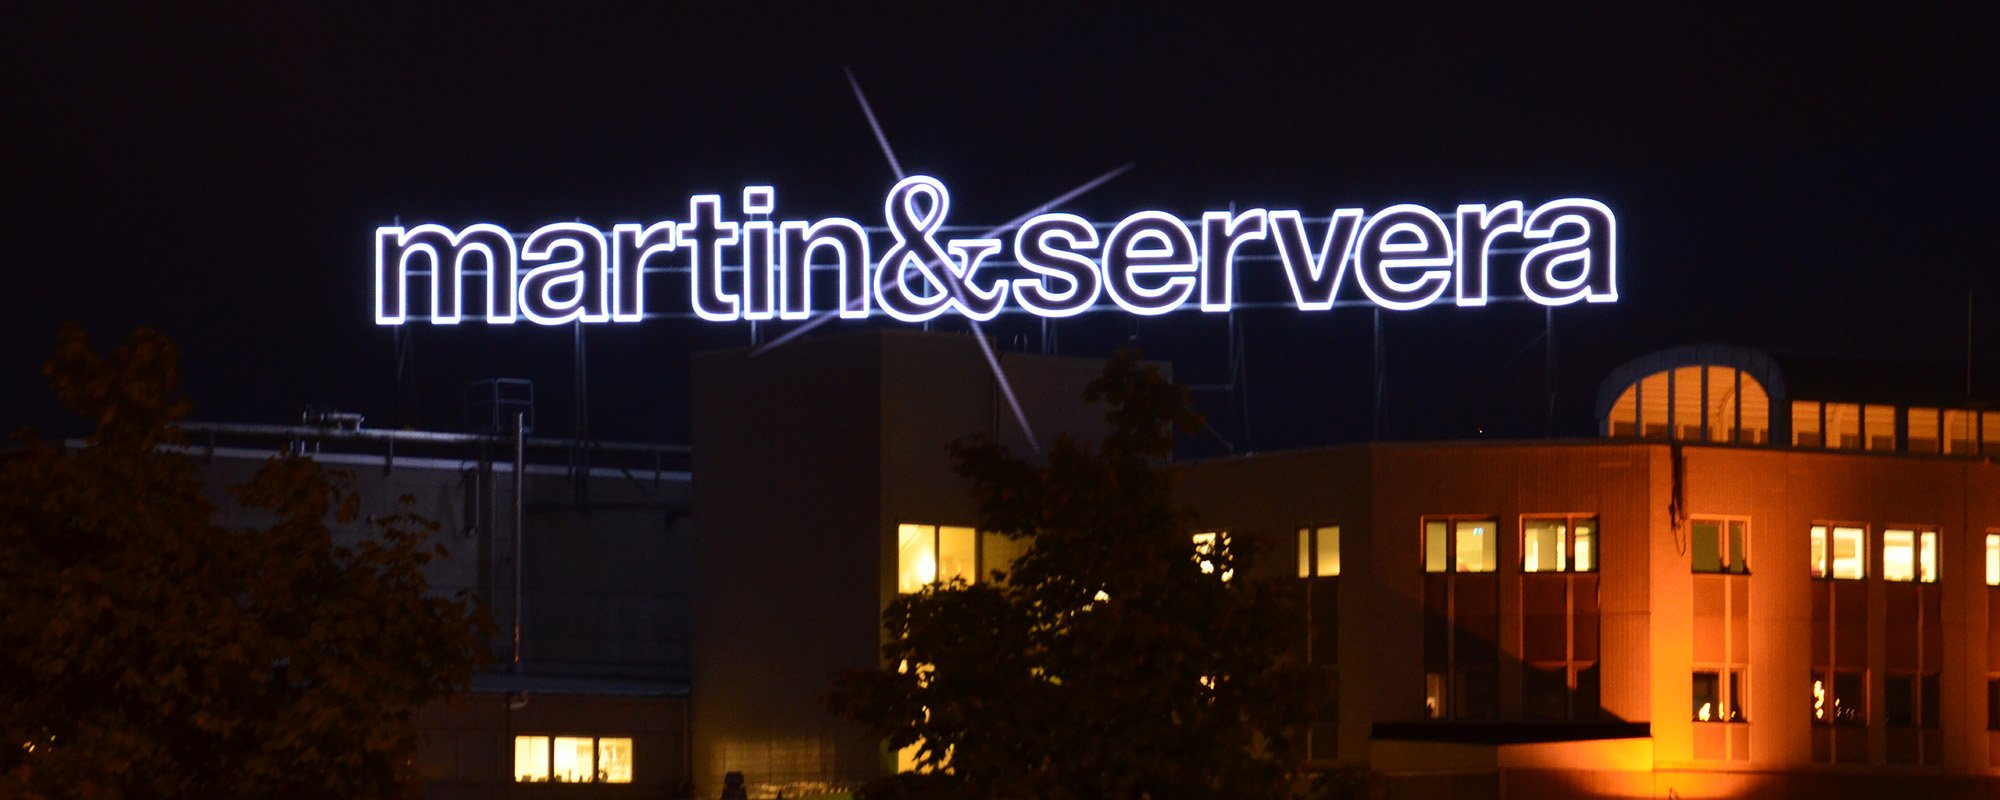 Martinservera takskylt av Focus Neon i Stockholm